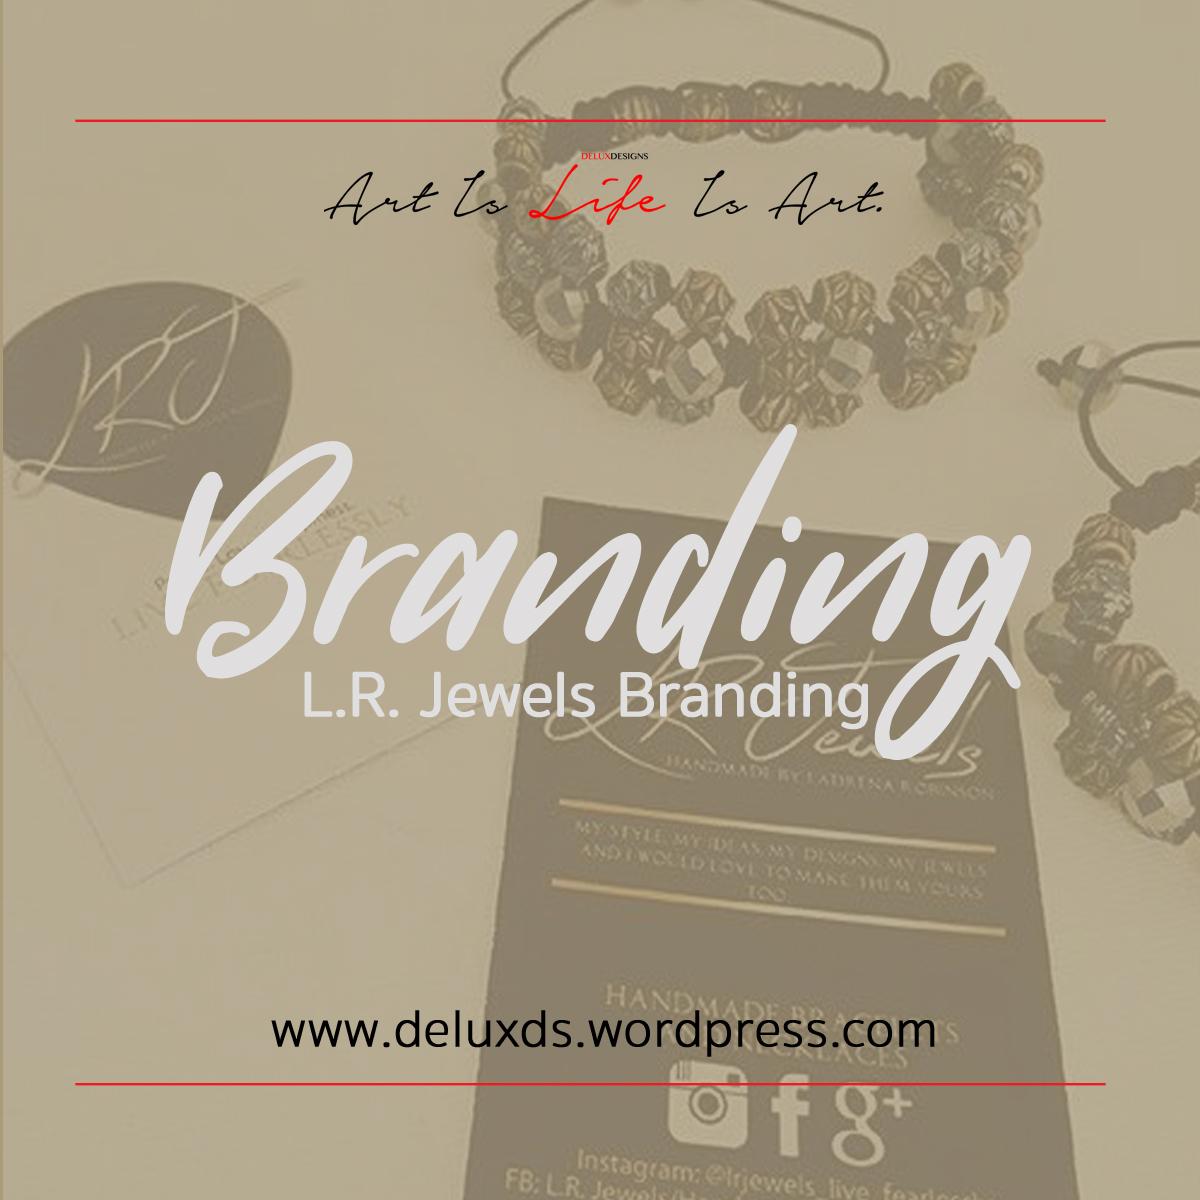 LR Jewels Branding